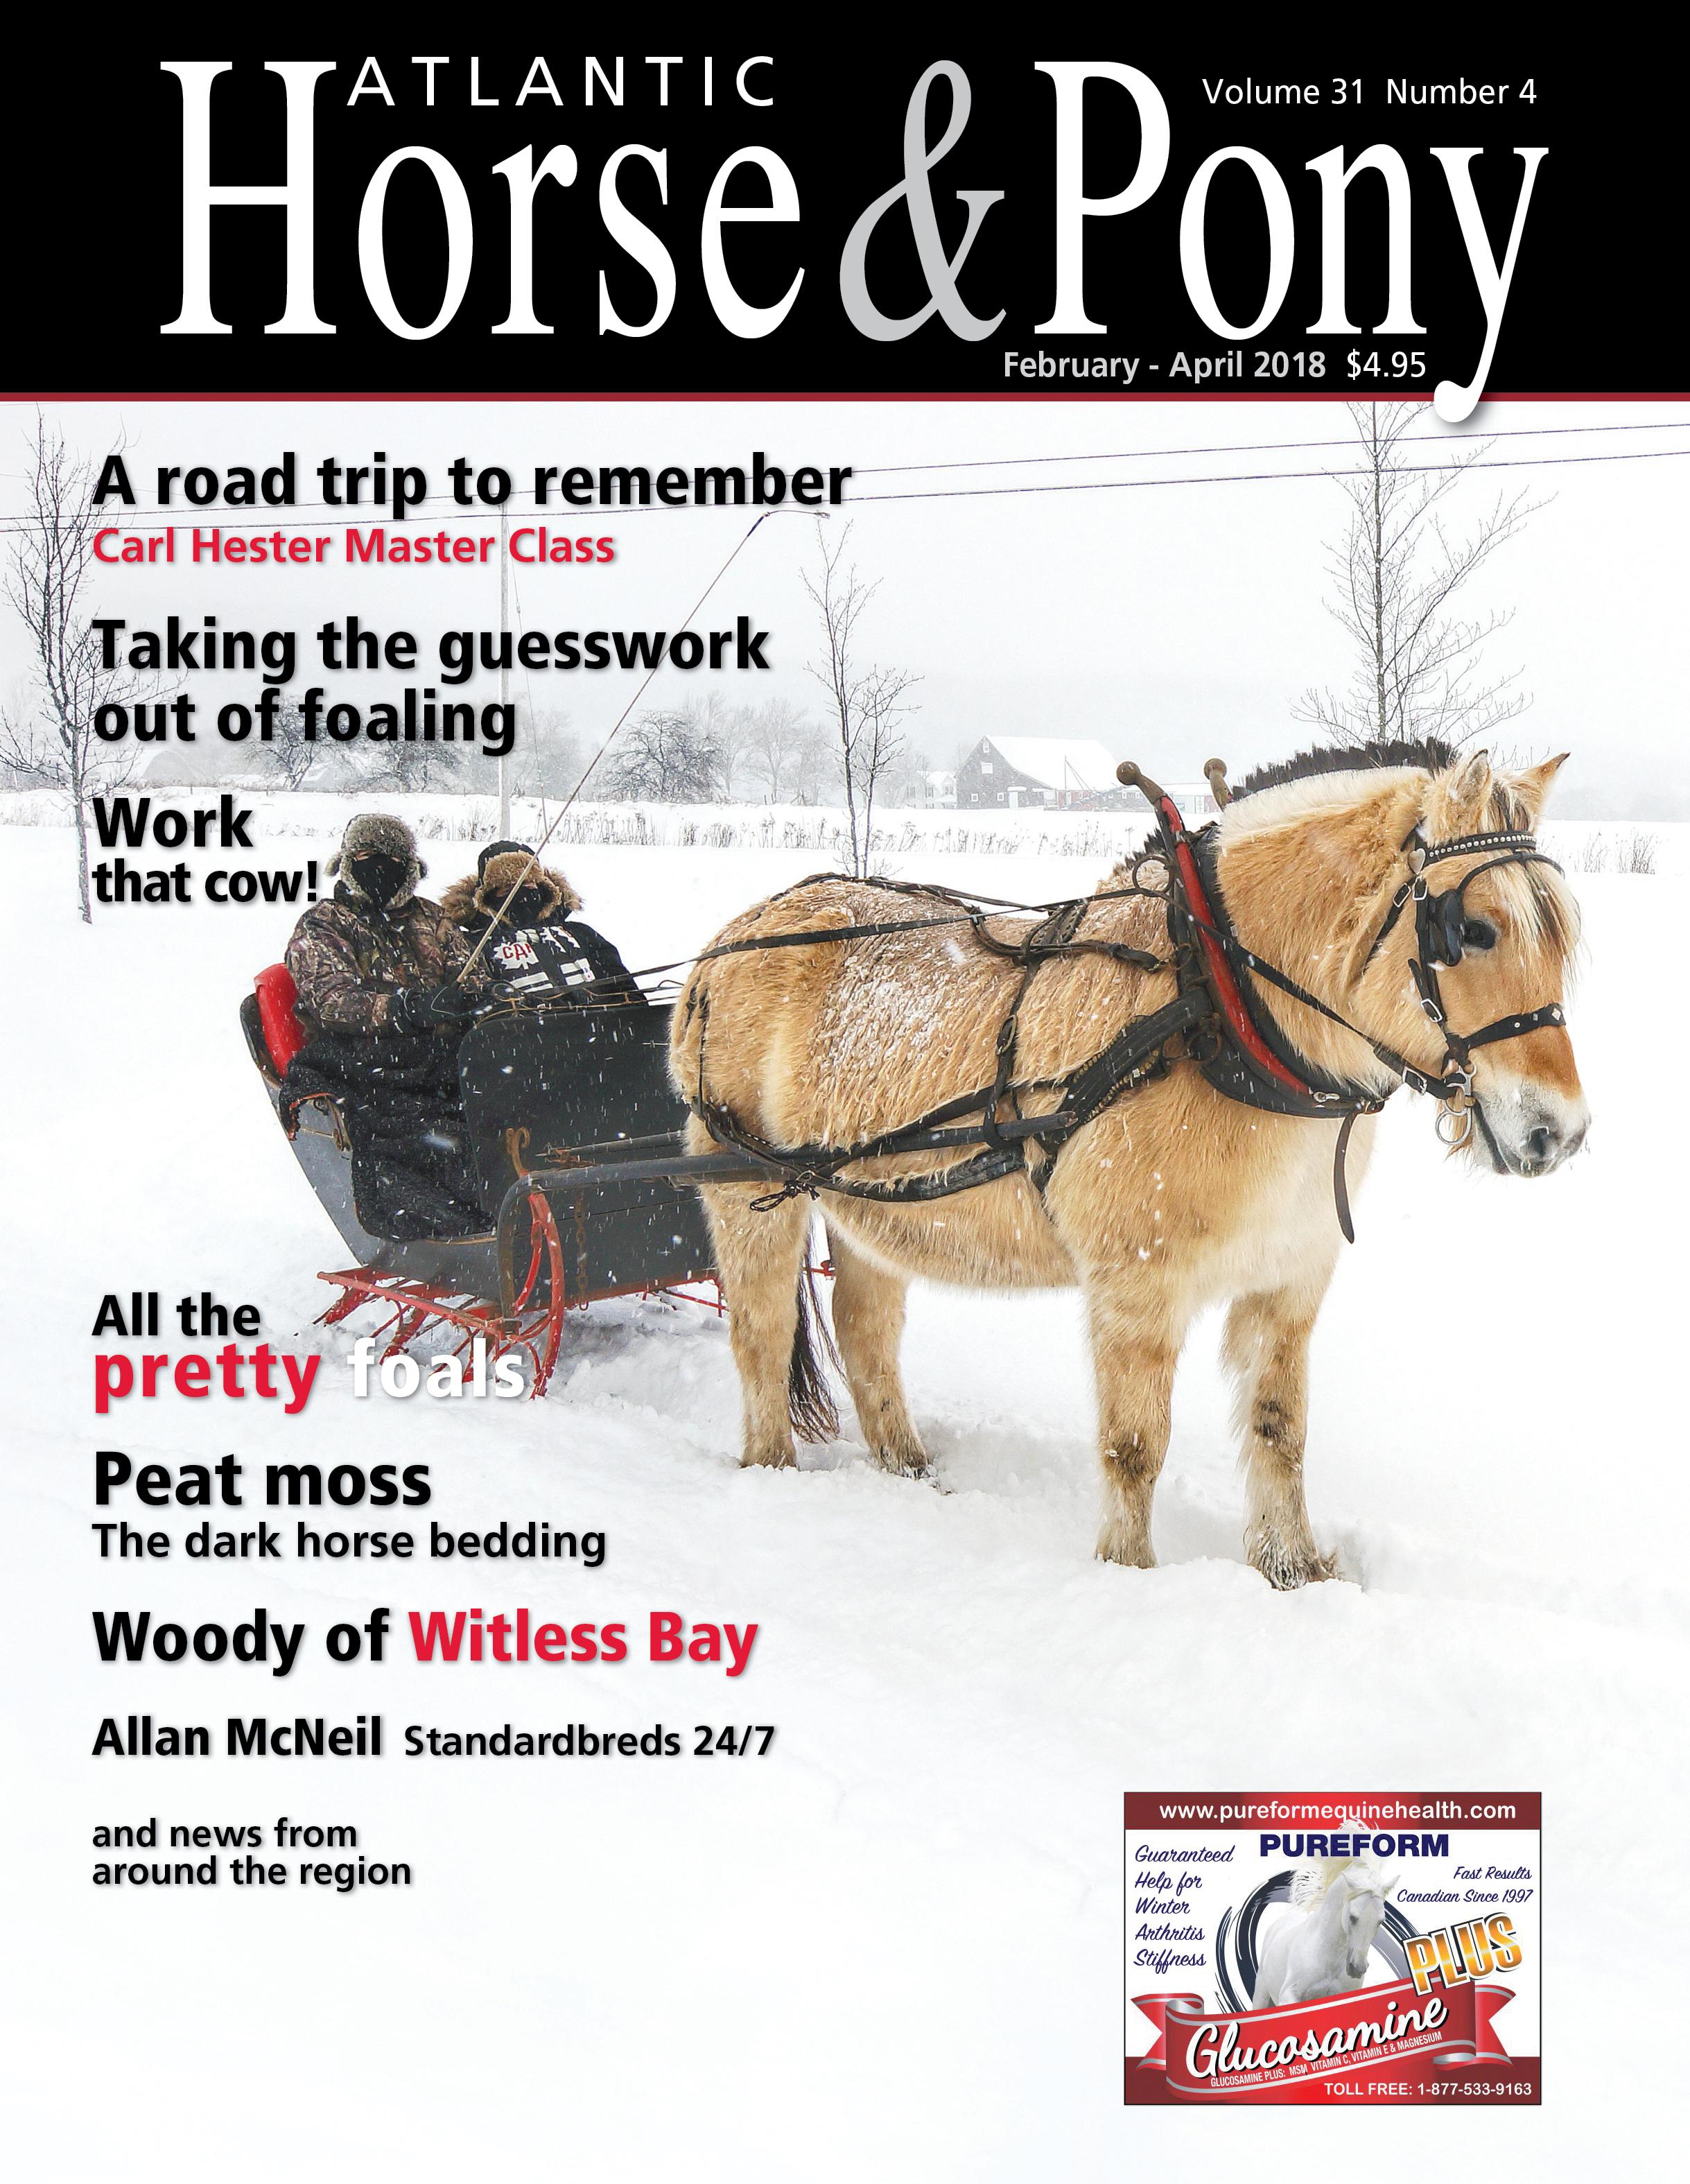 HorsePonyfeb2018.jpg